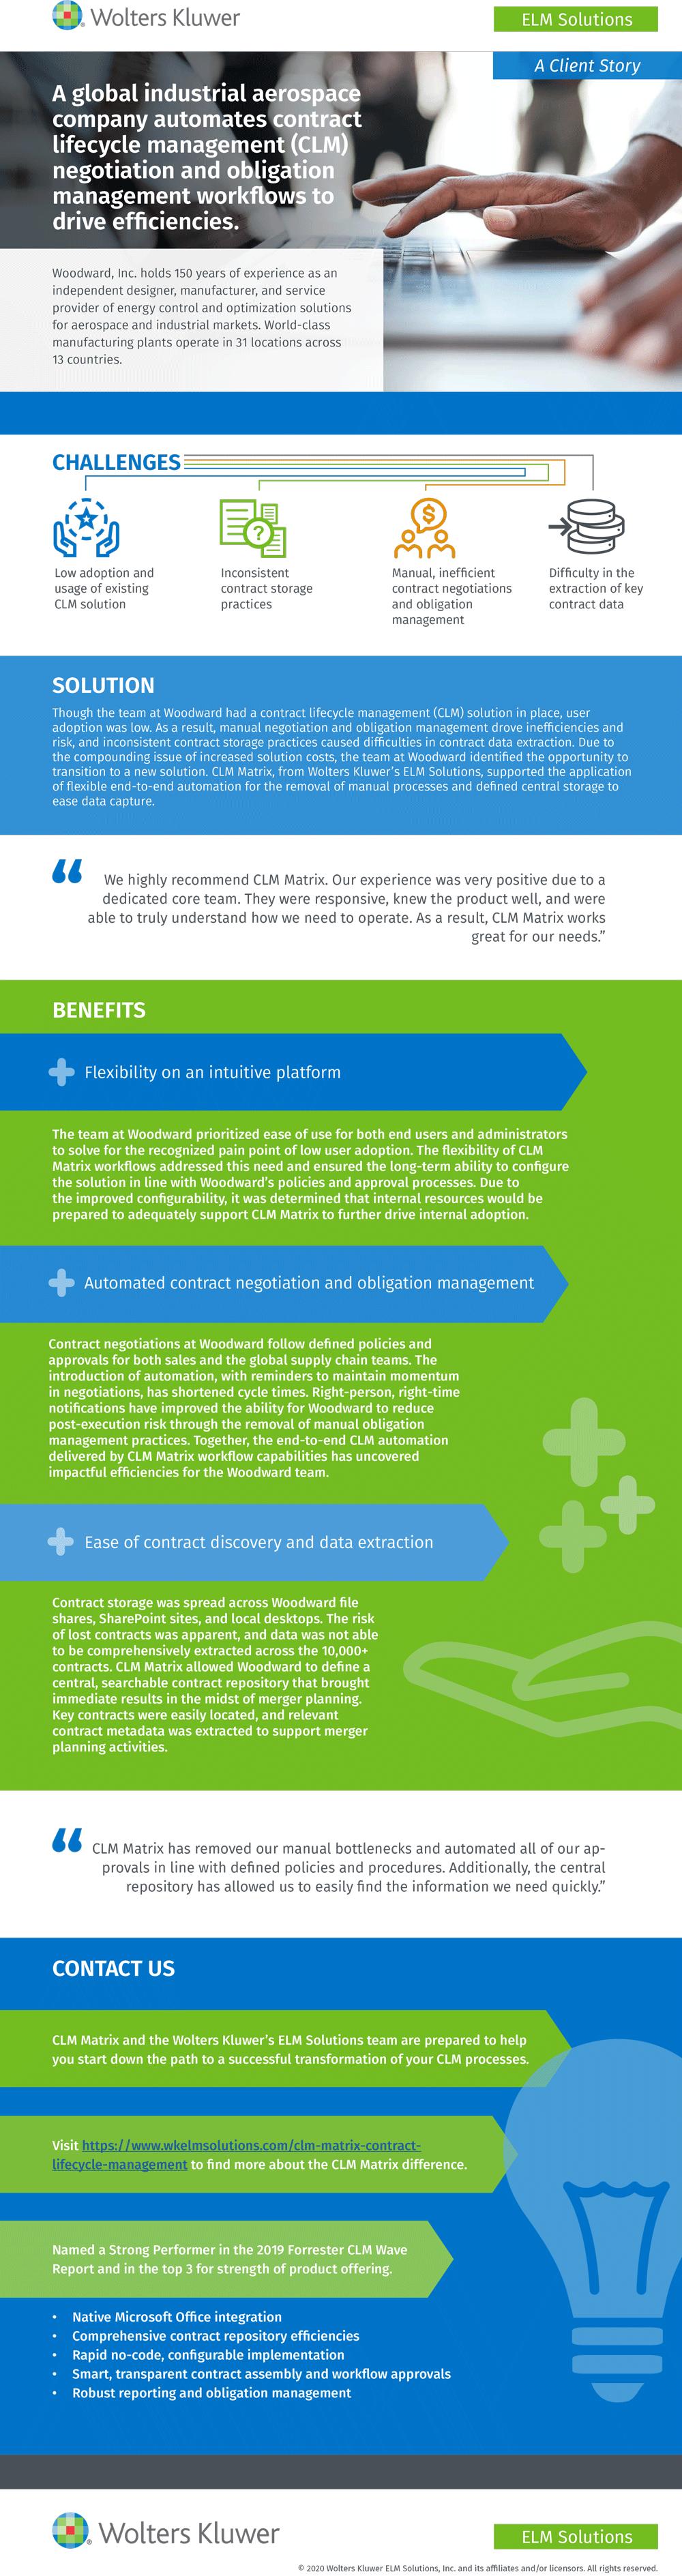 CLM Matrix for contract management